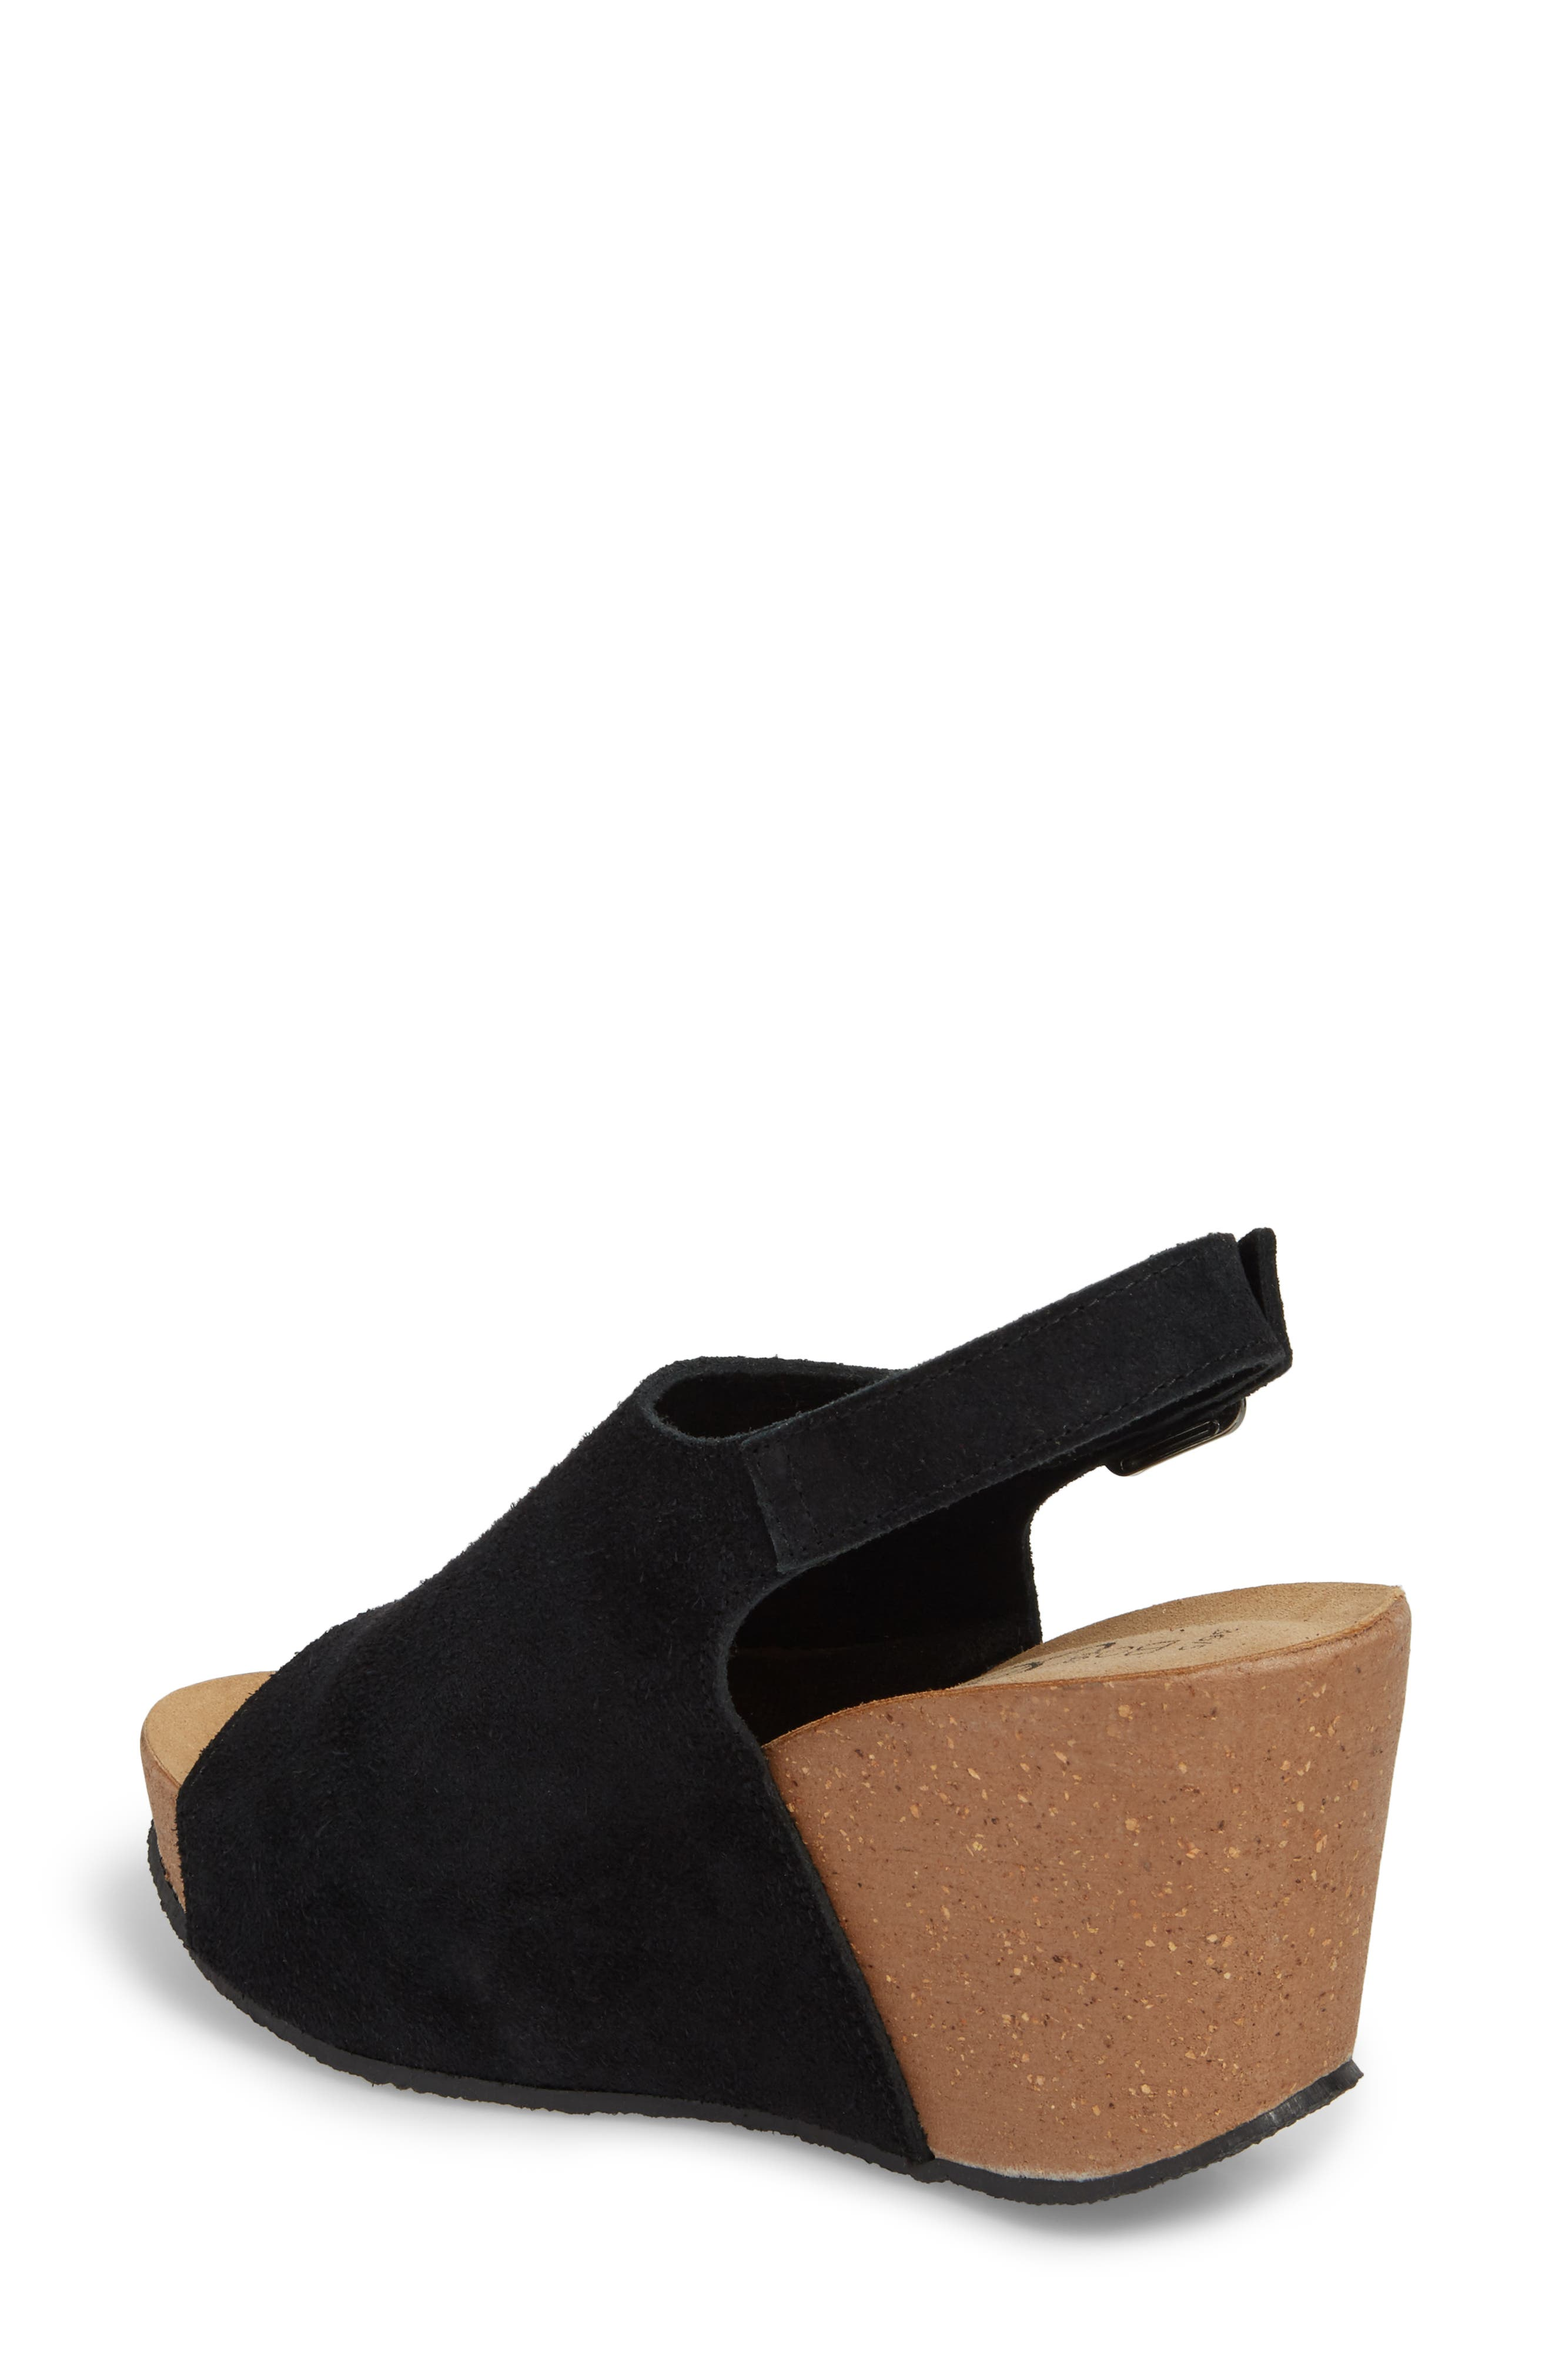 Sheila Platform Wedge Sandal,                             Alternate thumbnail 2, color,                             BLACK NUBUCK